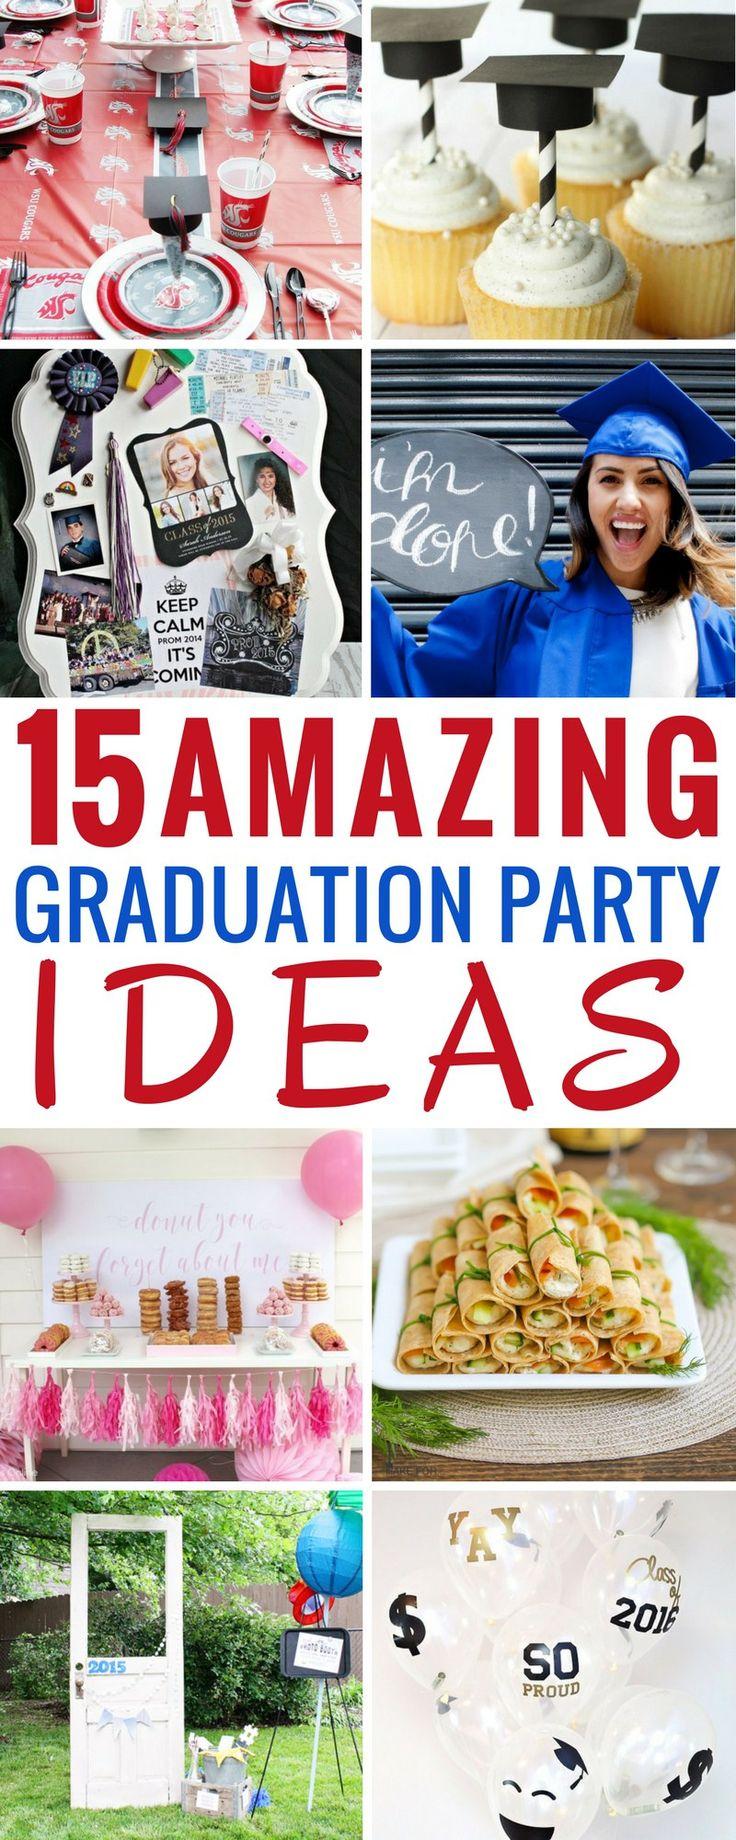 15 Graduation Party Ideas You Wish Your Parents Tried